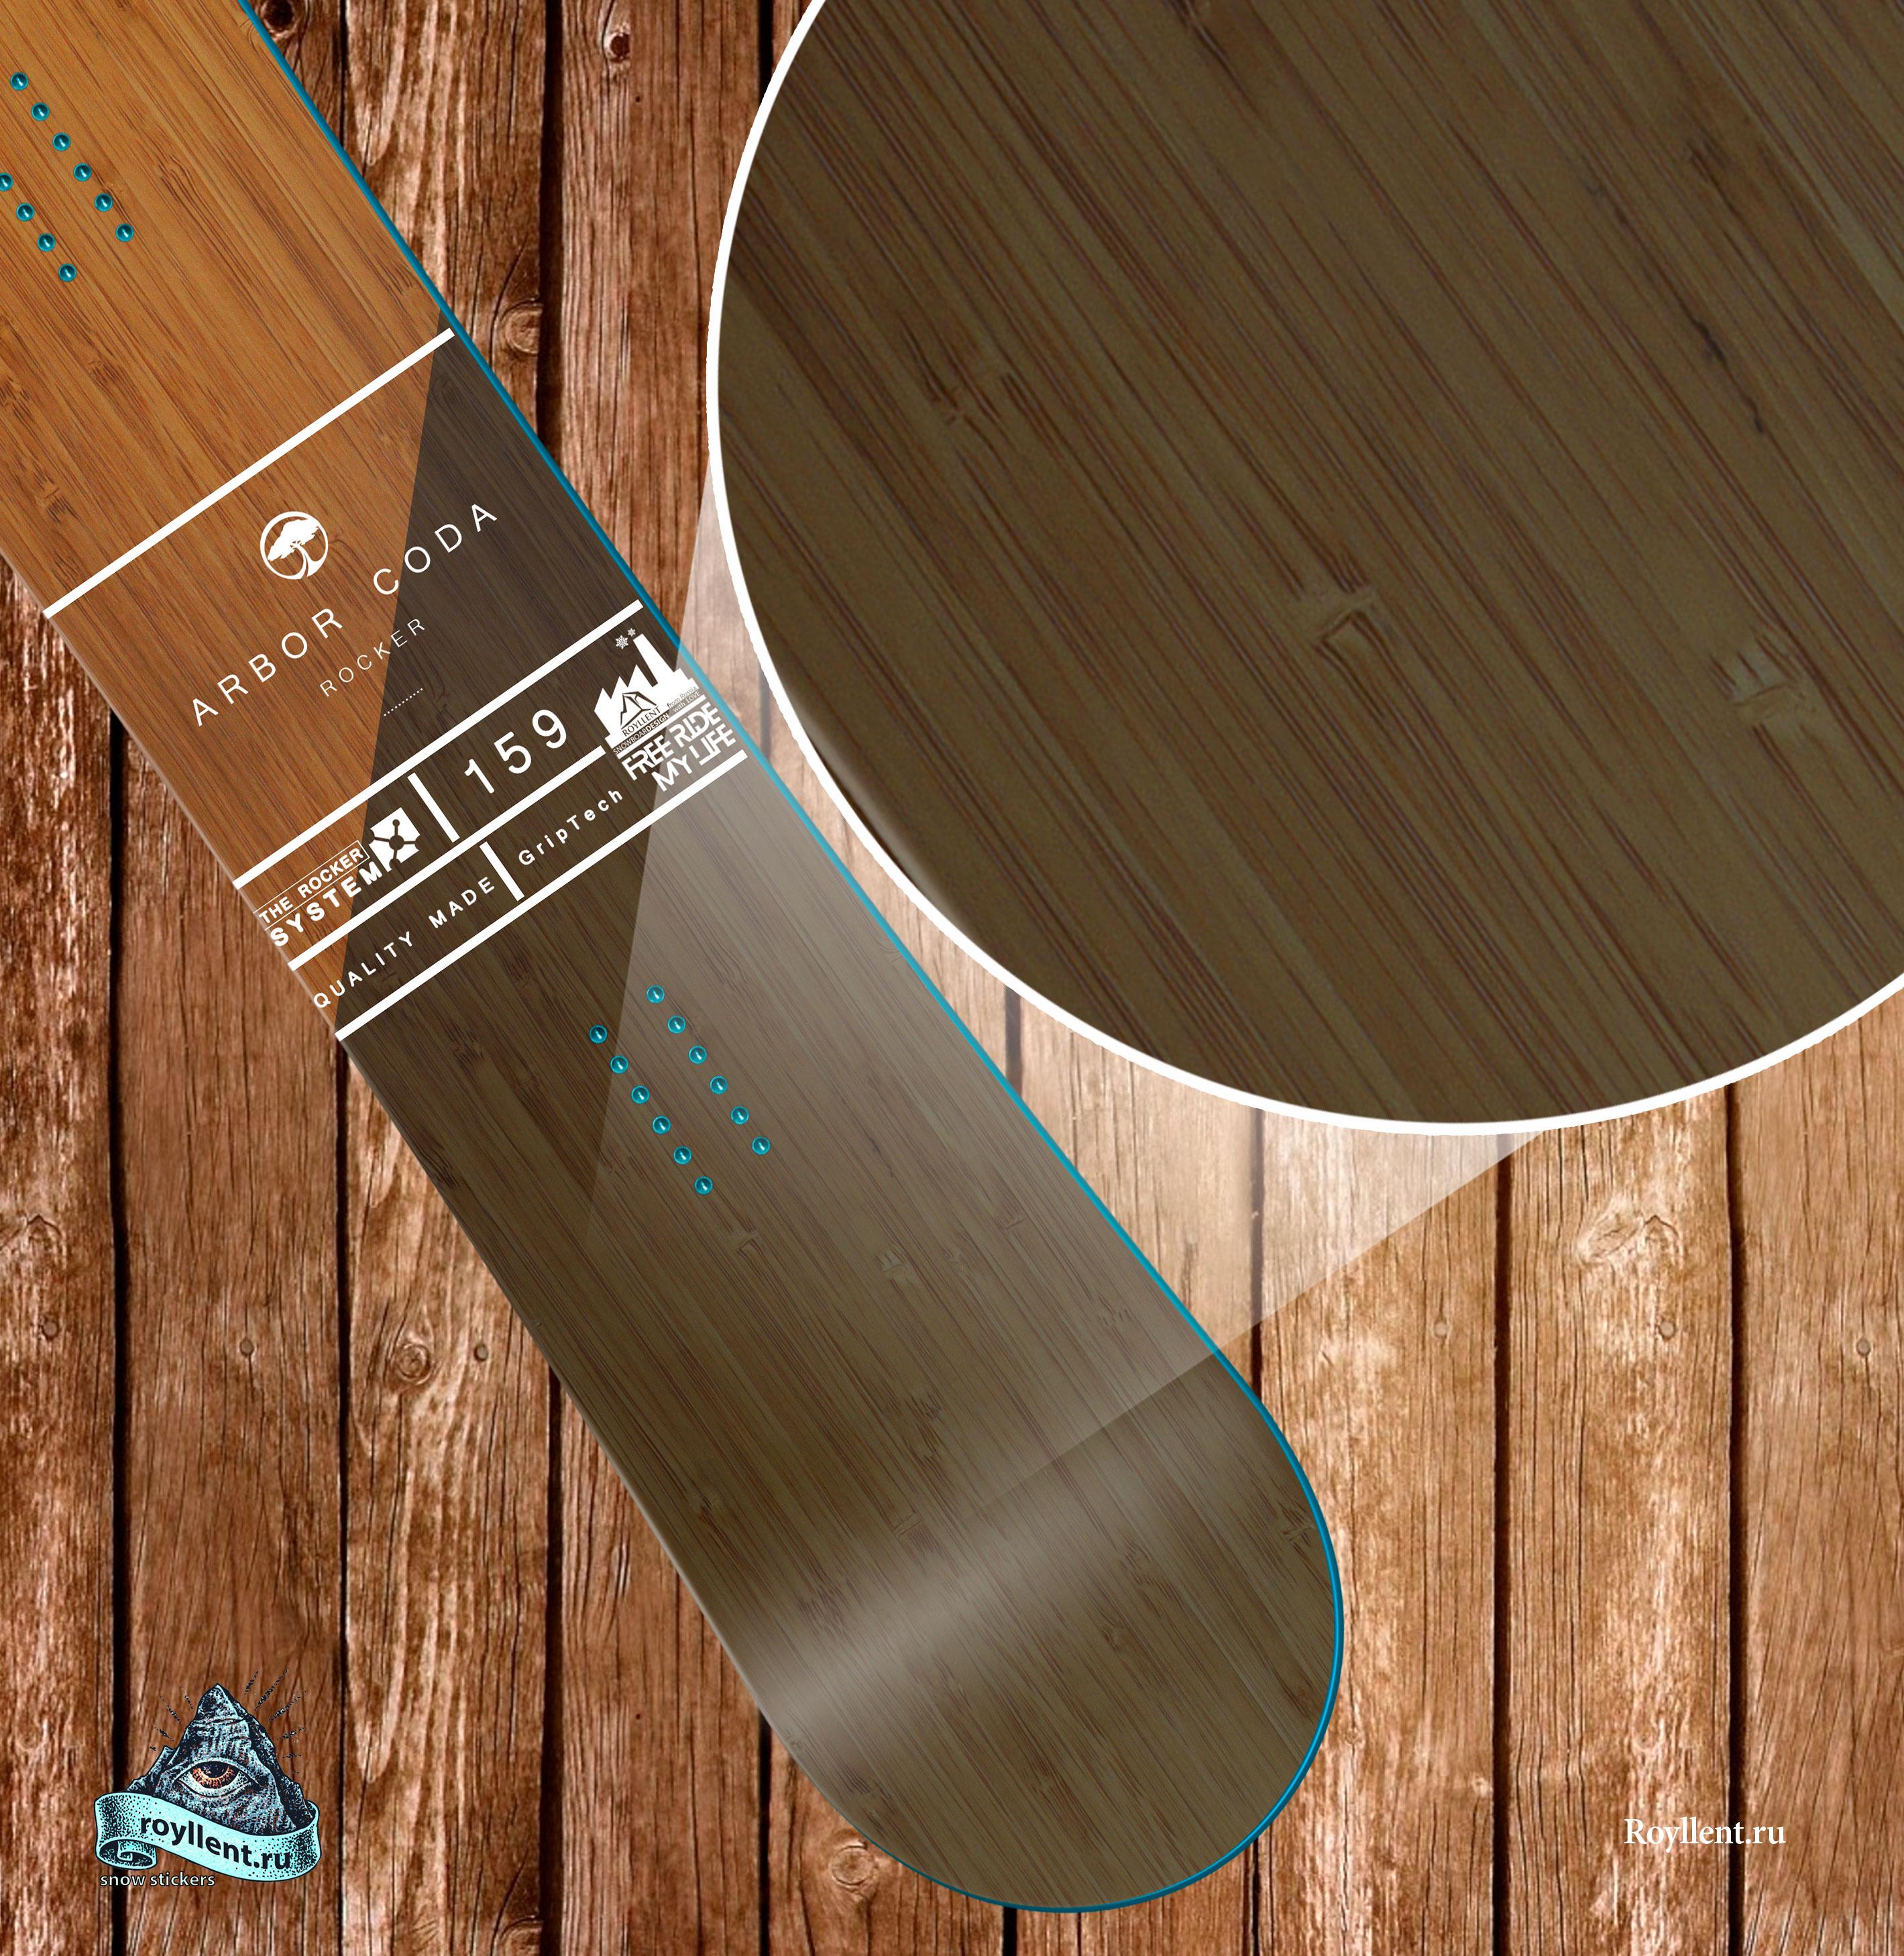 Arbor-Coda-Rocker купить сноуборд наклейку